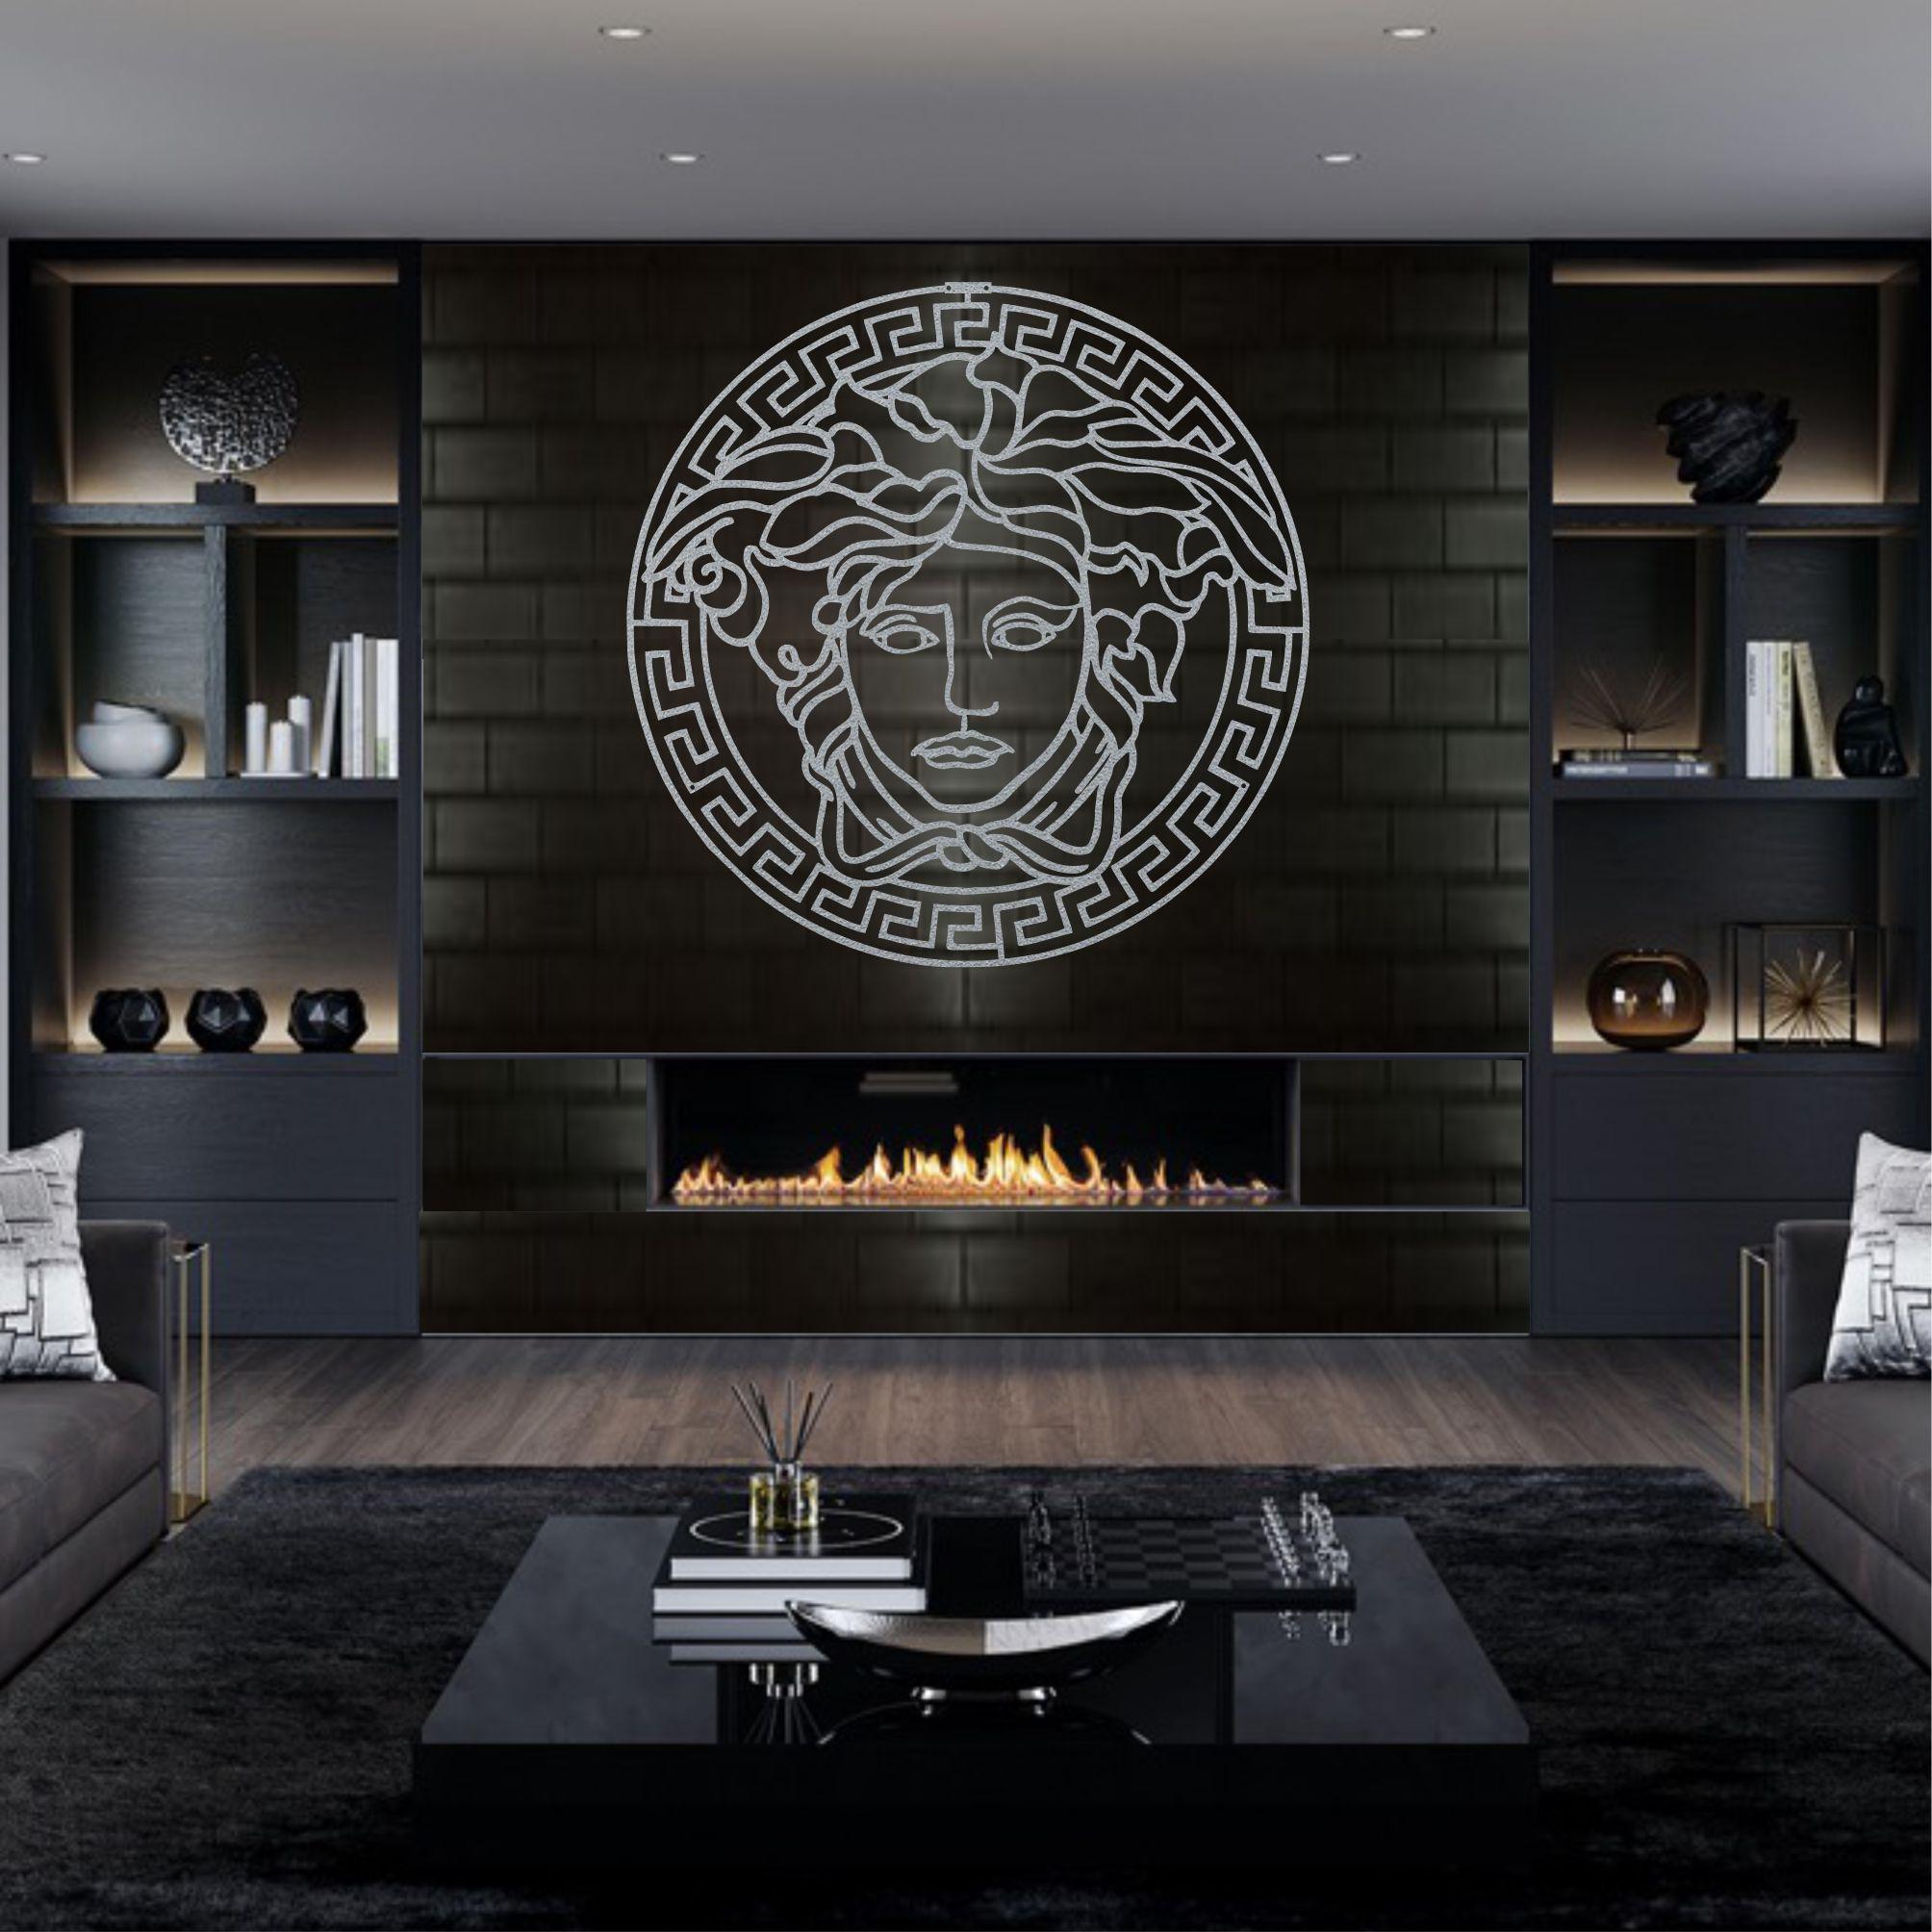 Office-Decoration Wall-Decor Mythology-Art Medusa Art Greek Bedroom Metal Home